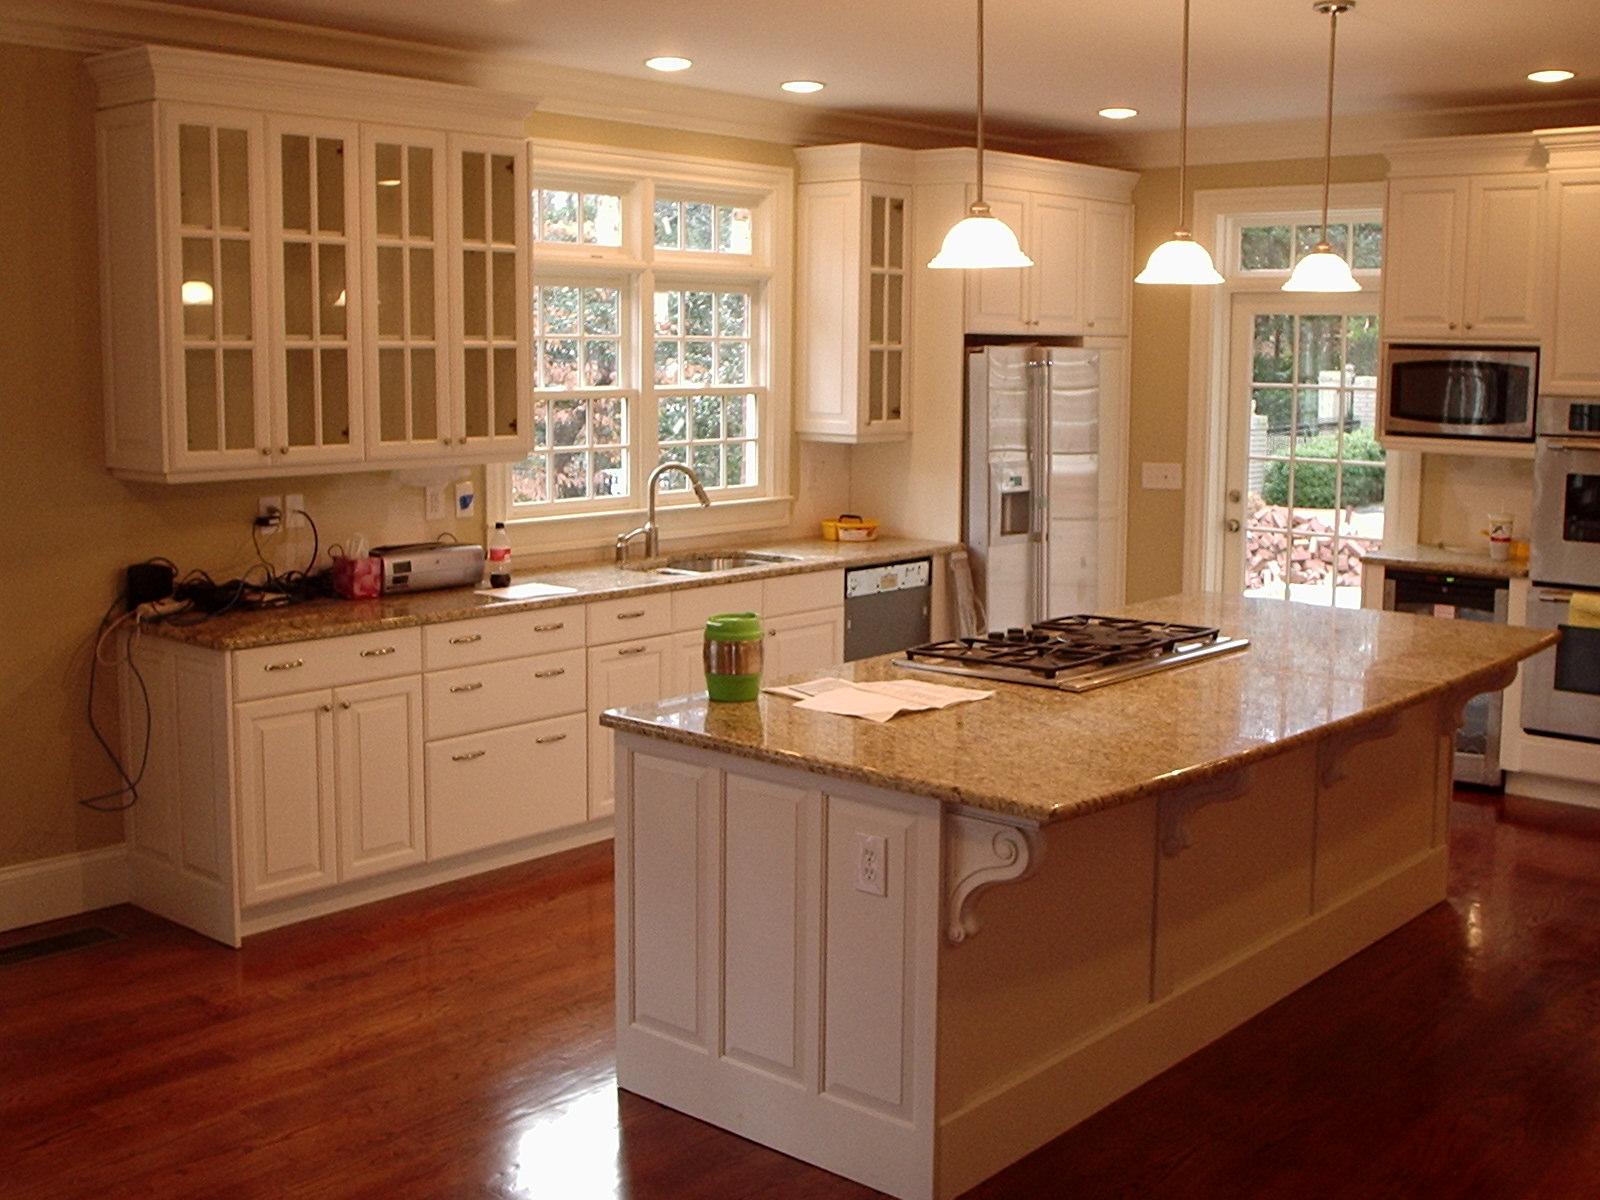 Kitchen pantry storage cabinet Photo - 6